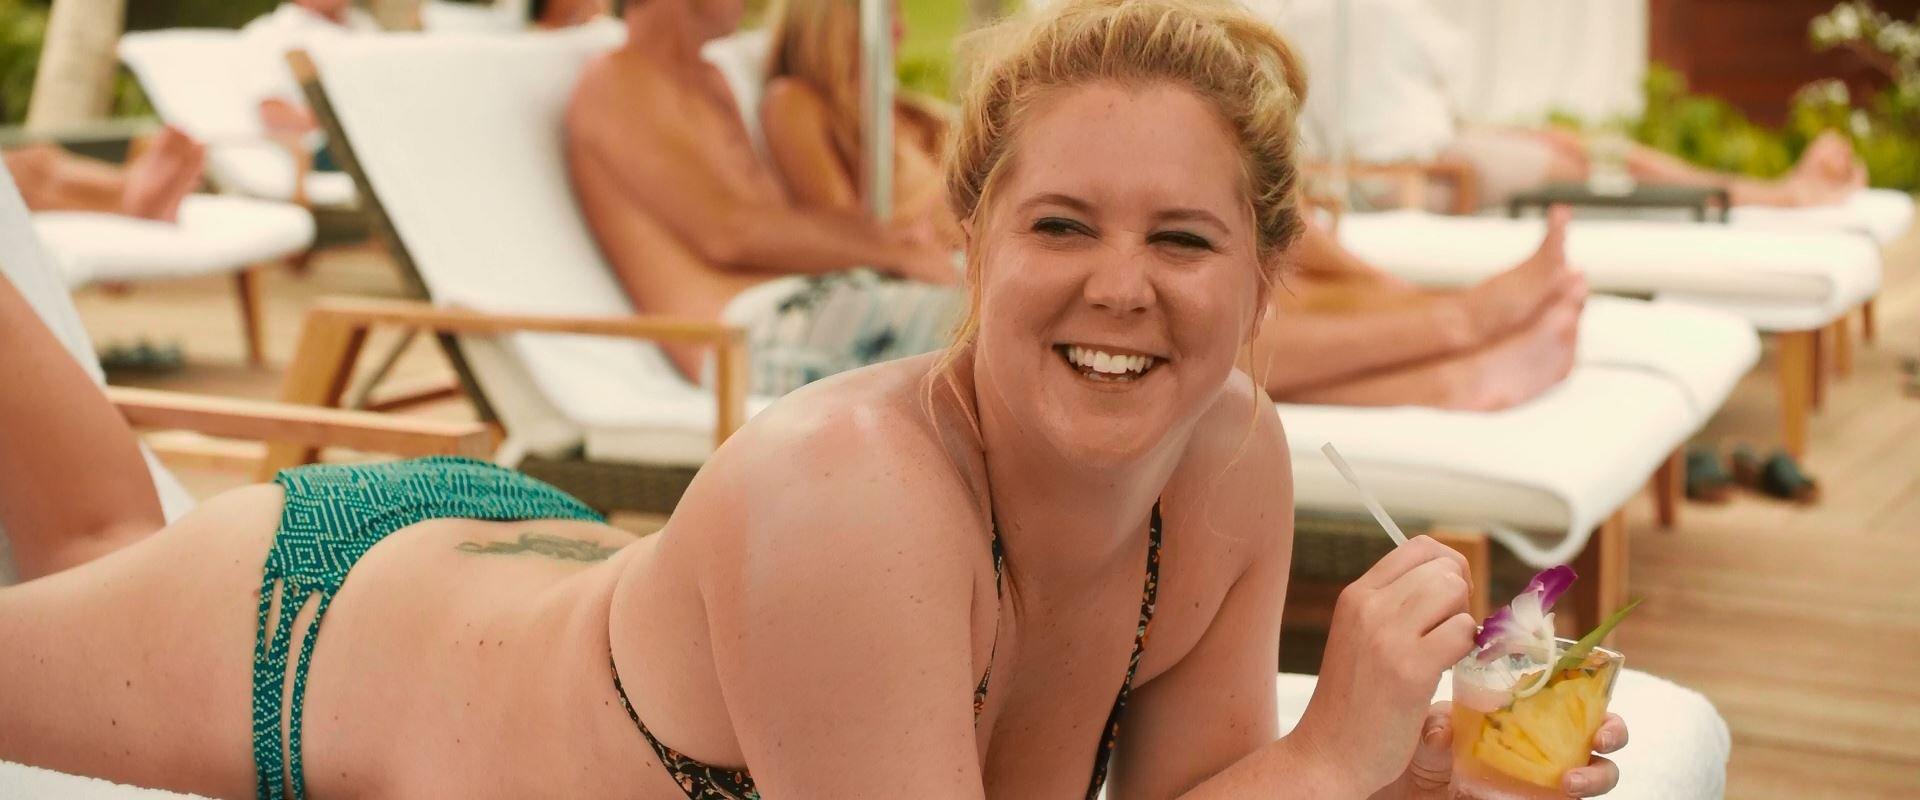 Amy schumer naked body